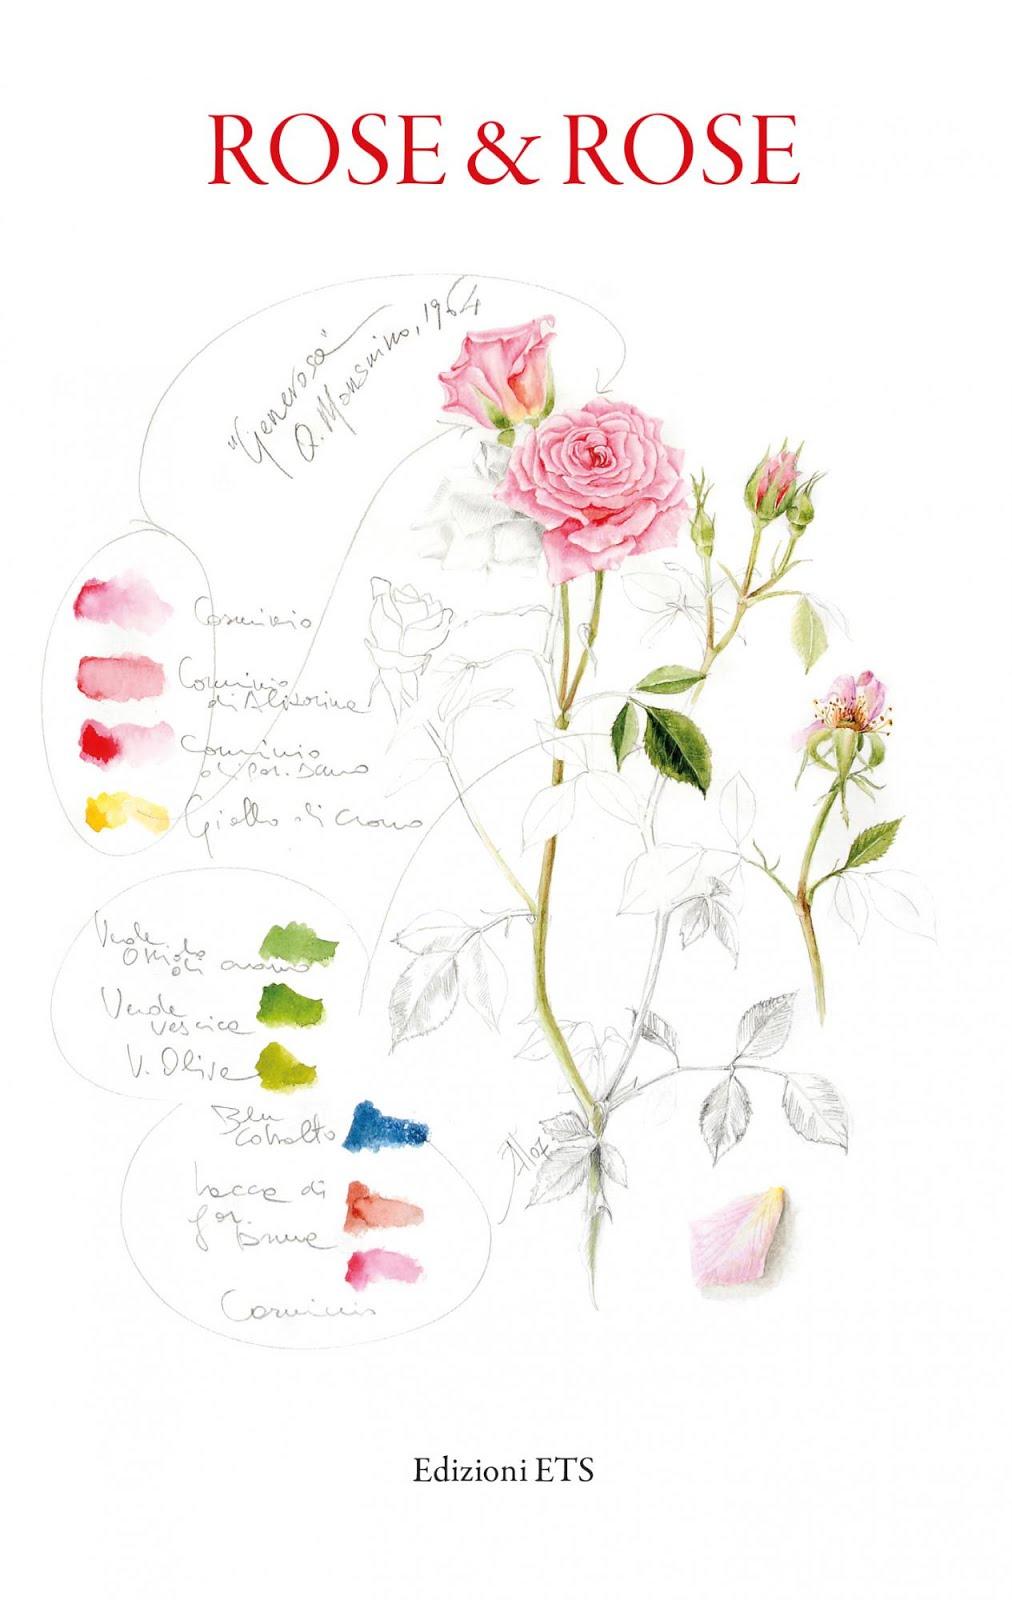 Rose, rose e ancora rose